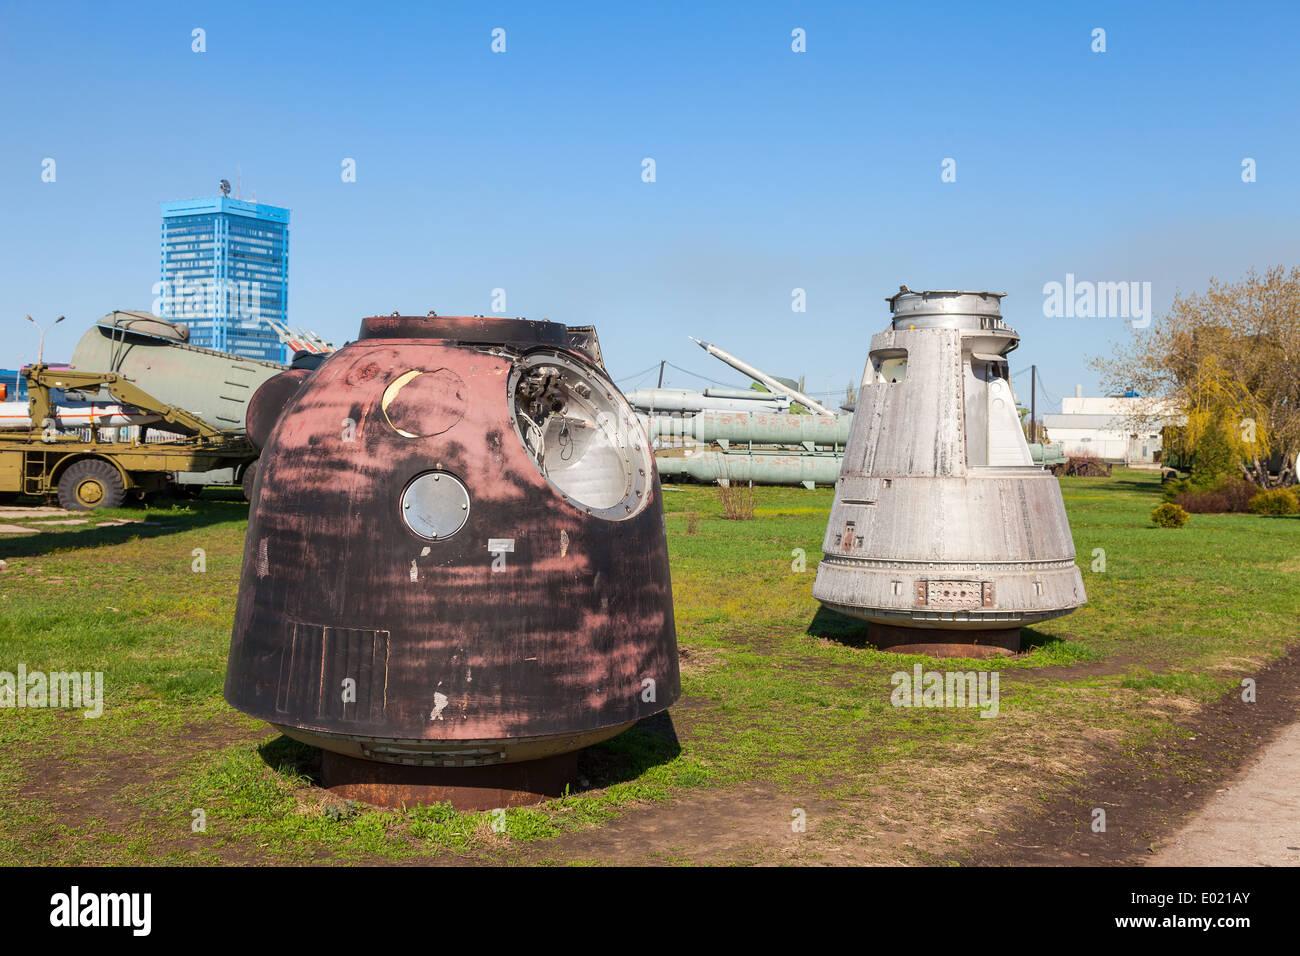 Lander spacecraft 'Soyuz' and returned bay satellite photo reconnaissance 'Yantar-2K' - Stock Image